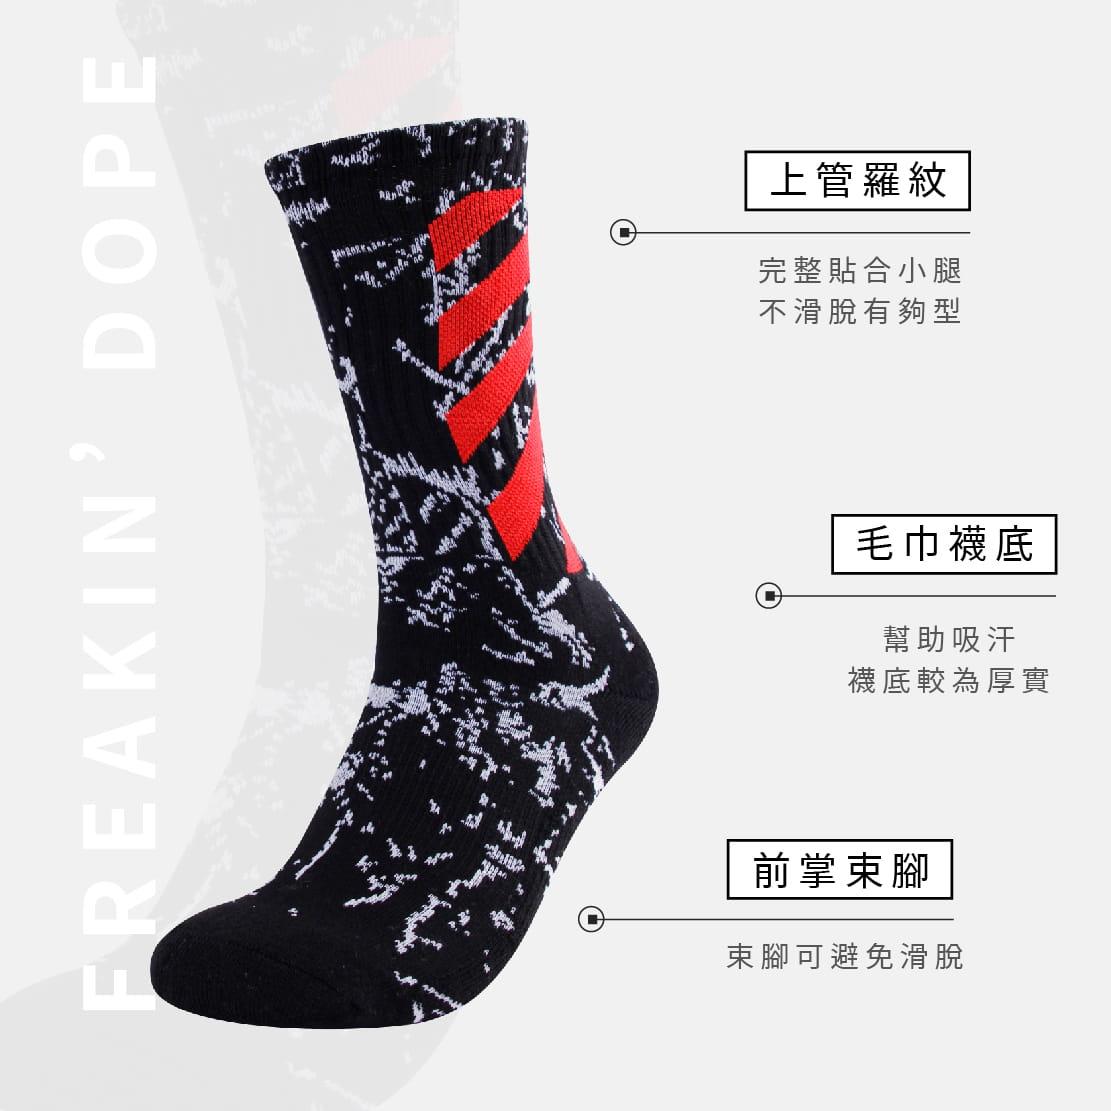 【FAV】ins爆裂紋中筒襪 2